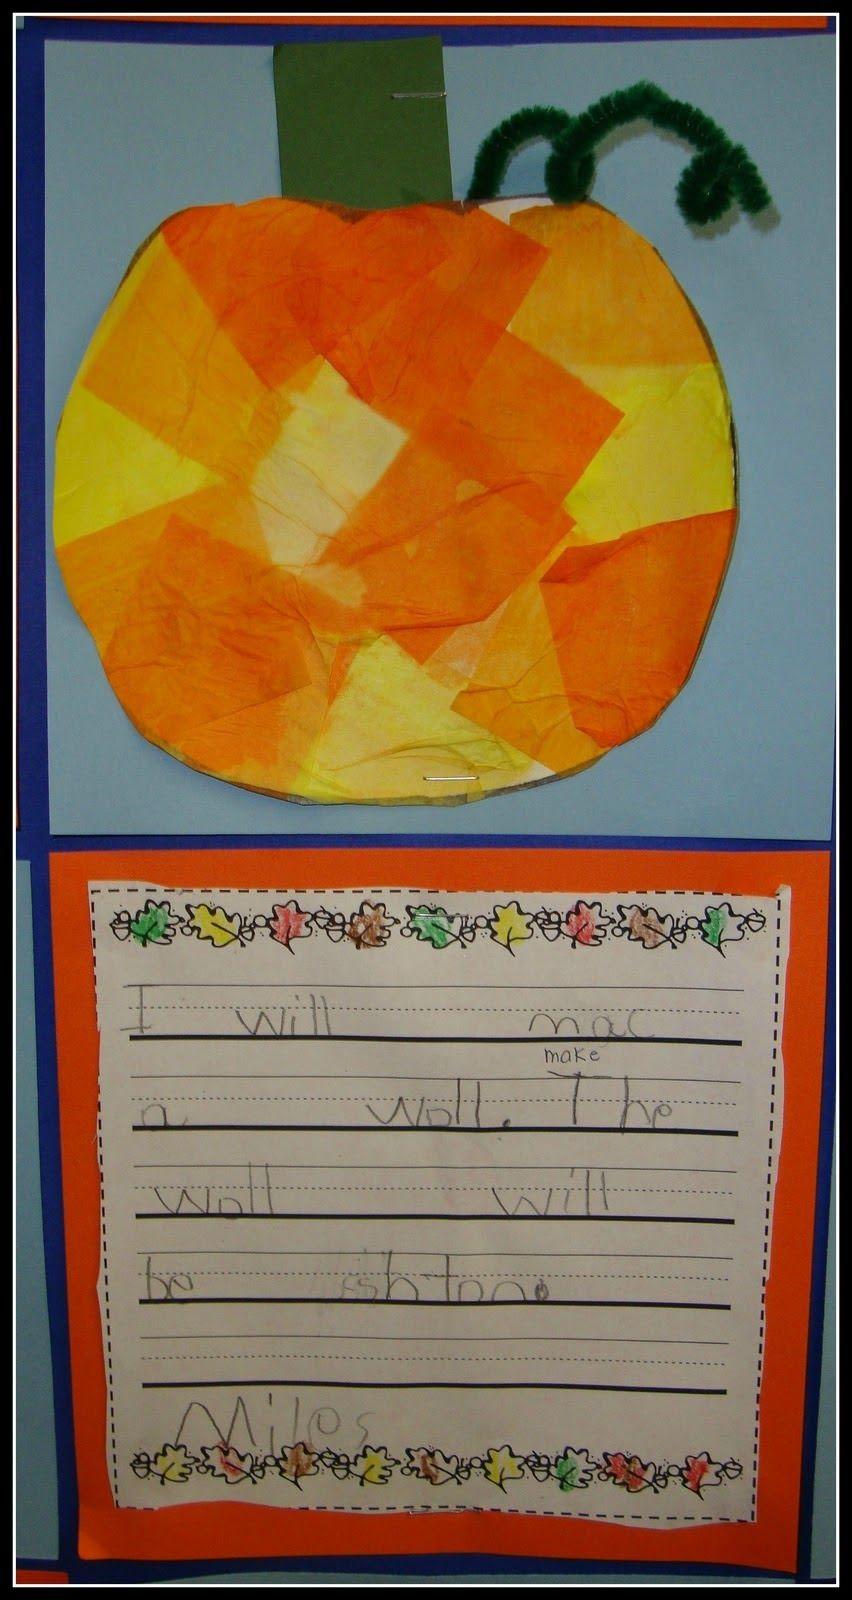 Spookly the Square Pumpkin literature response activity ...